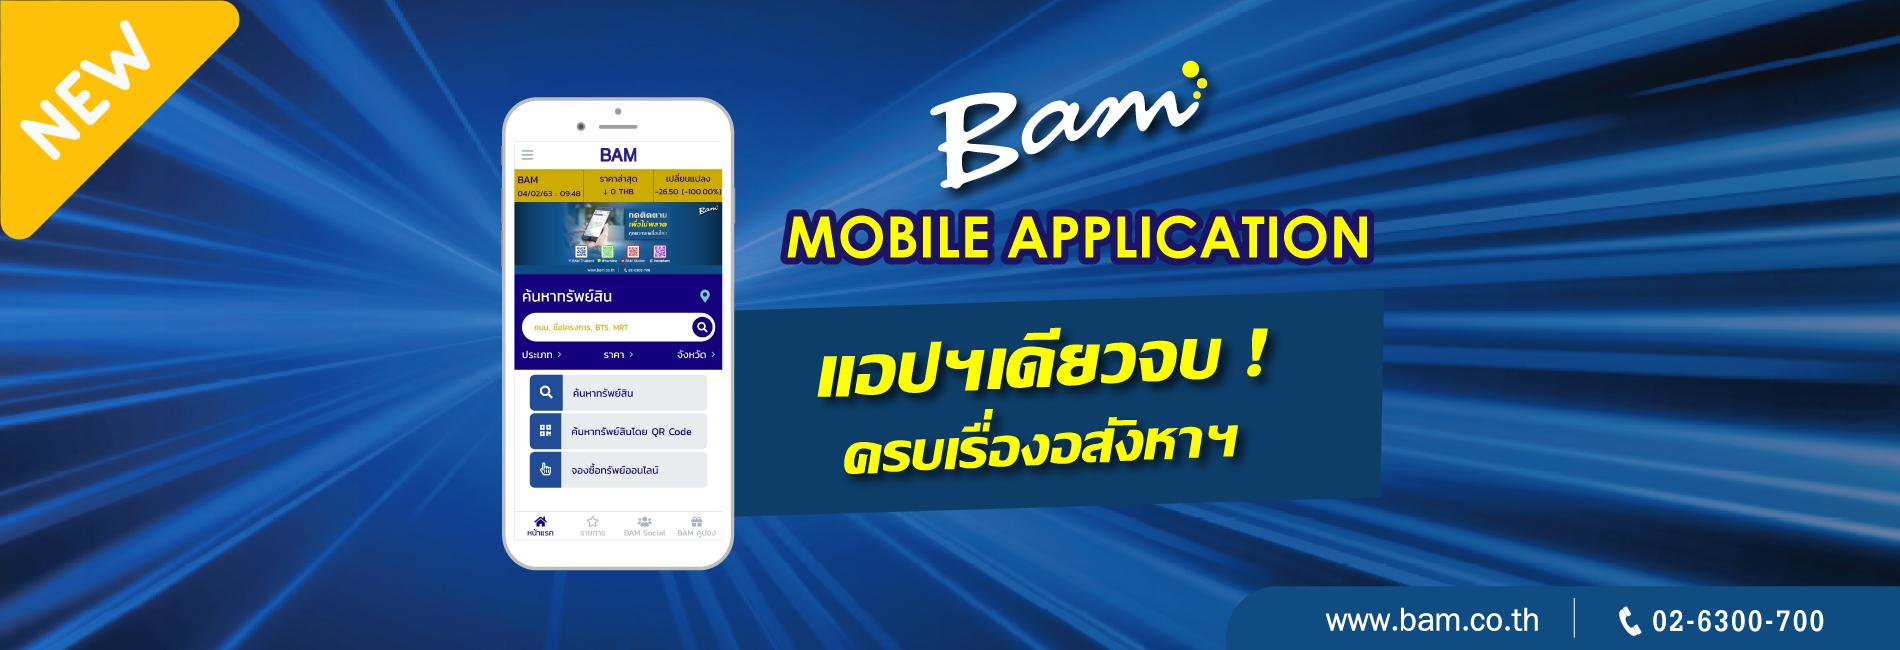 BAM MOBILE APPLICATION